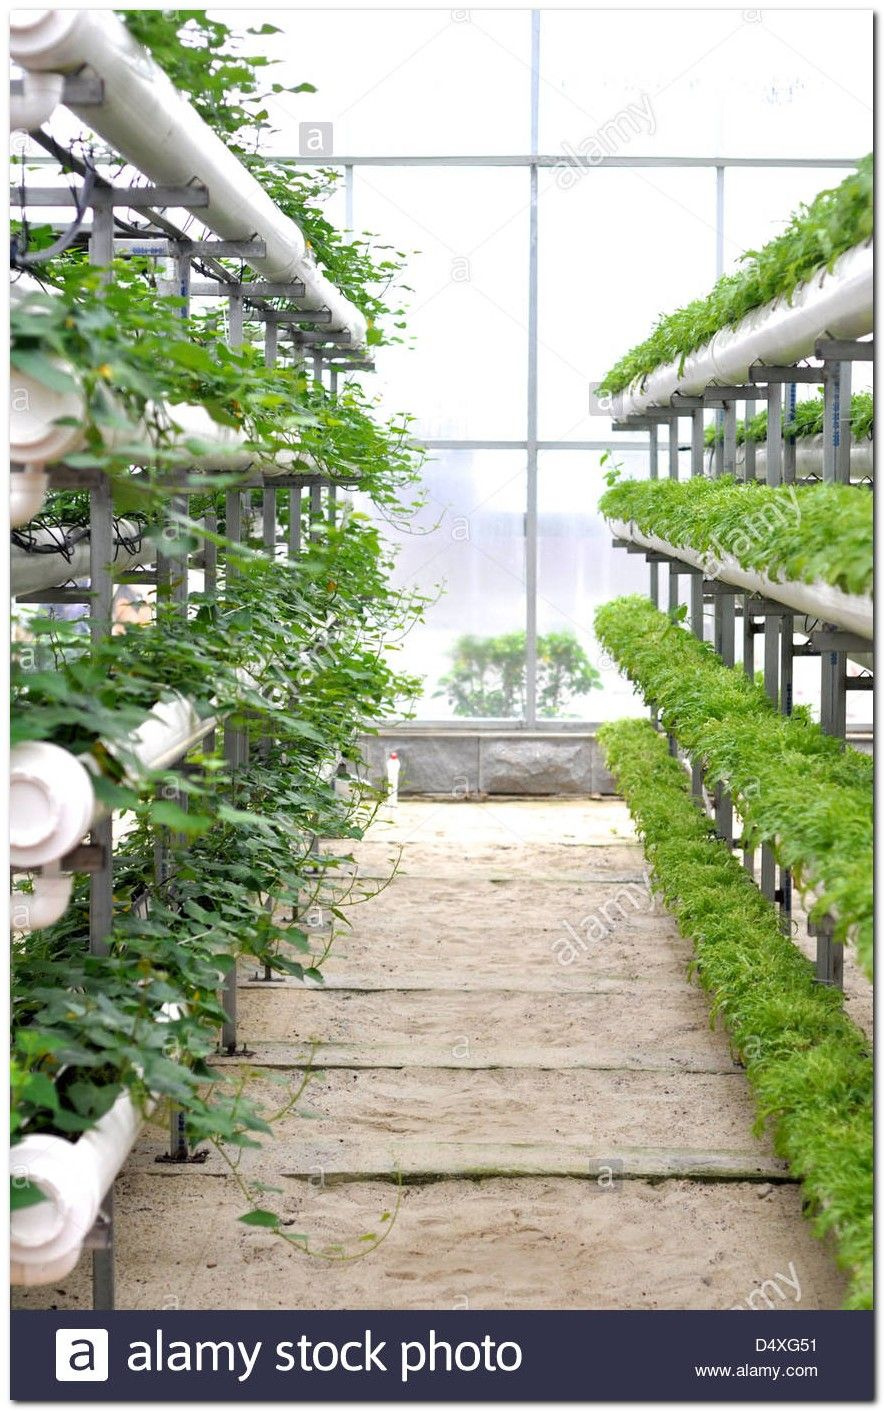 50+ Beautiful Modern Greenhouse Ideas | Pinterest | Modern ... on greenhouse landscaping, greenhouse cucumbers, greenhouse tomato, greenhouse horticulture, greenhouse vegetable gardening, greenhouse plants, greenhouse home, greenhouse gardener,